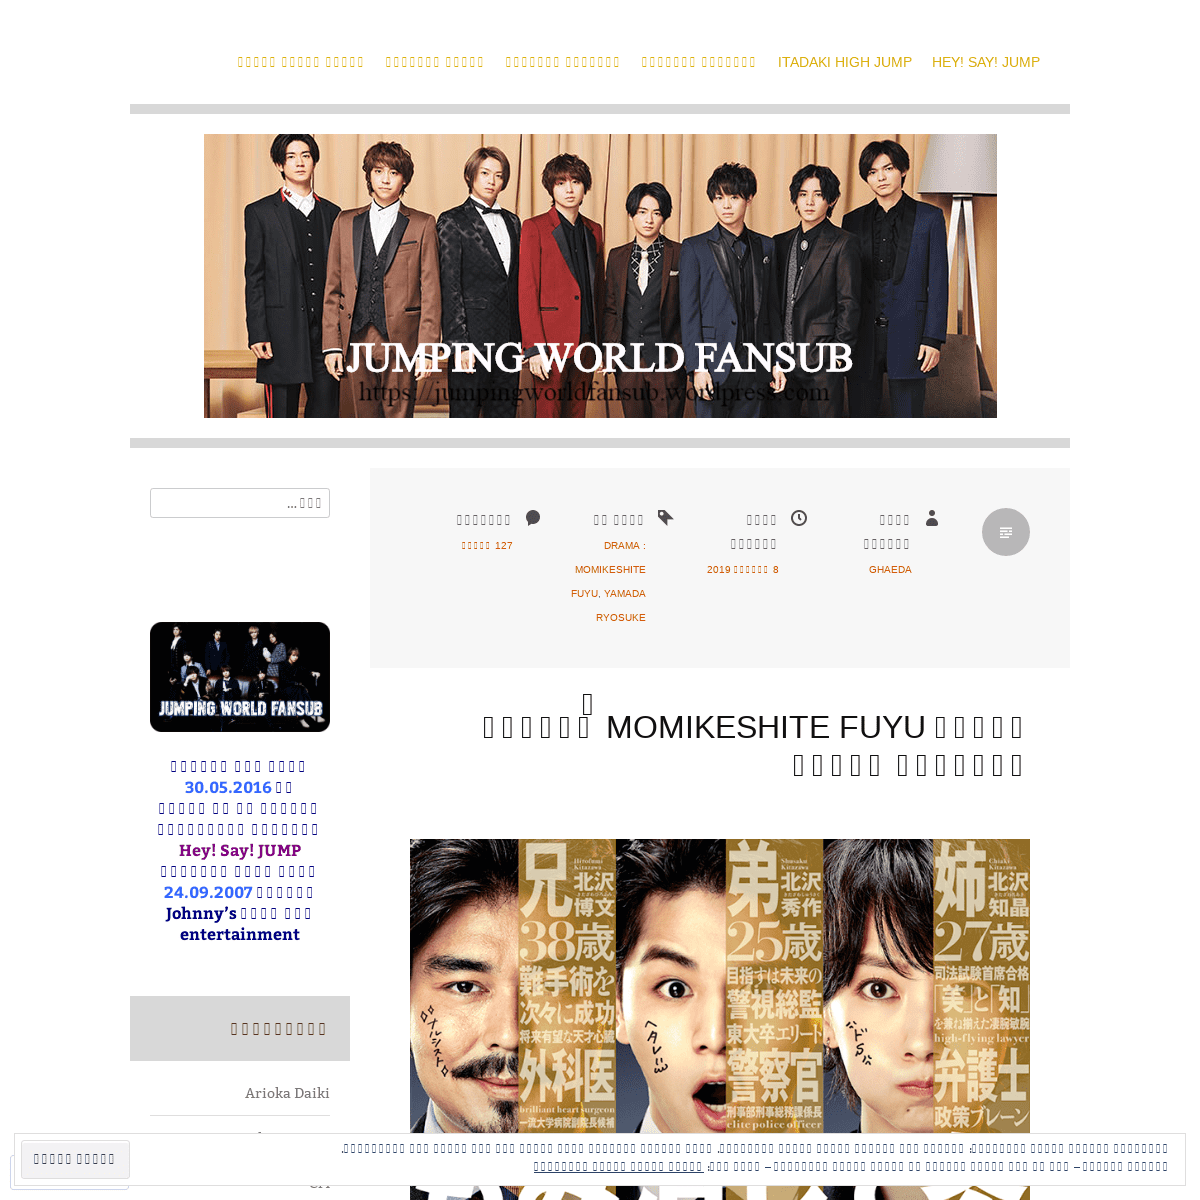 JUMPing World Fansub - لترجمة كل ما يتعلق بالفرقة اليابانية Hey! Say! JUMP